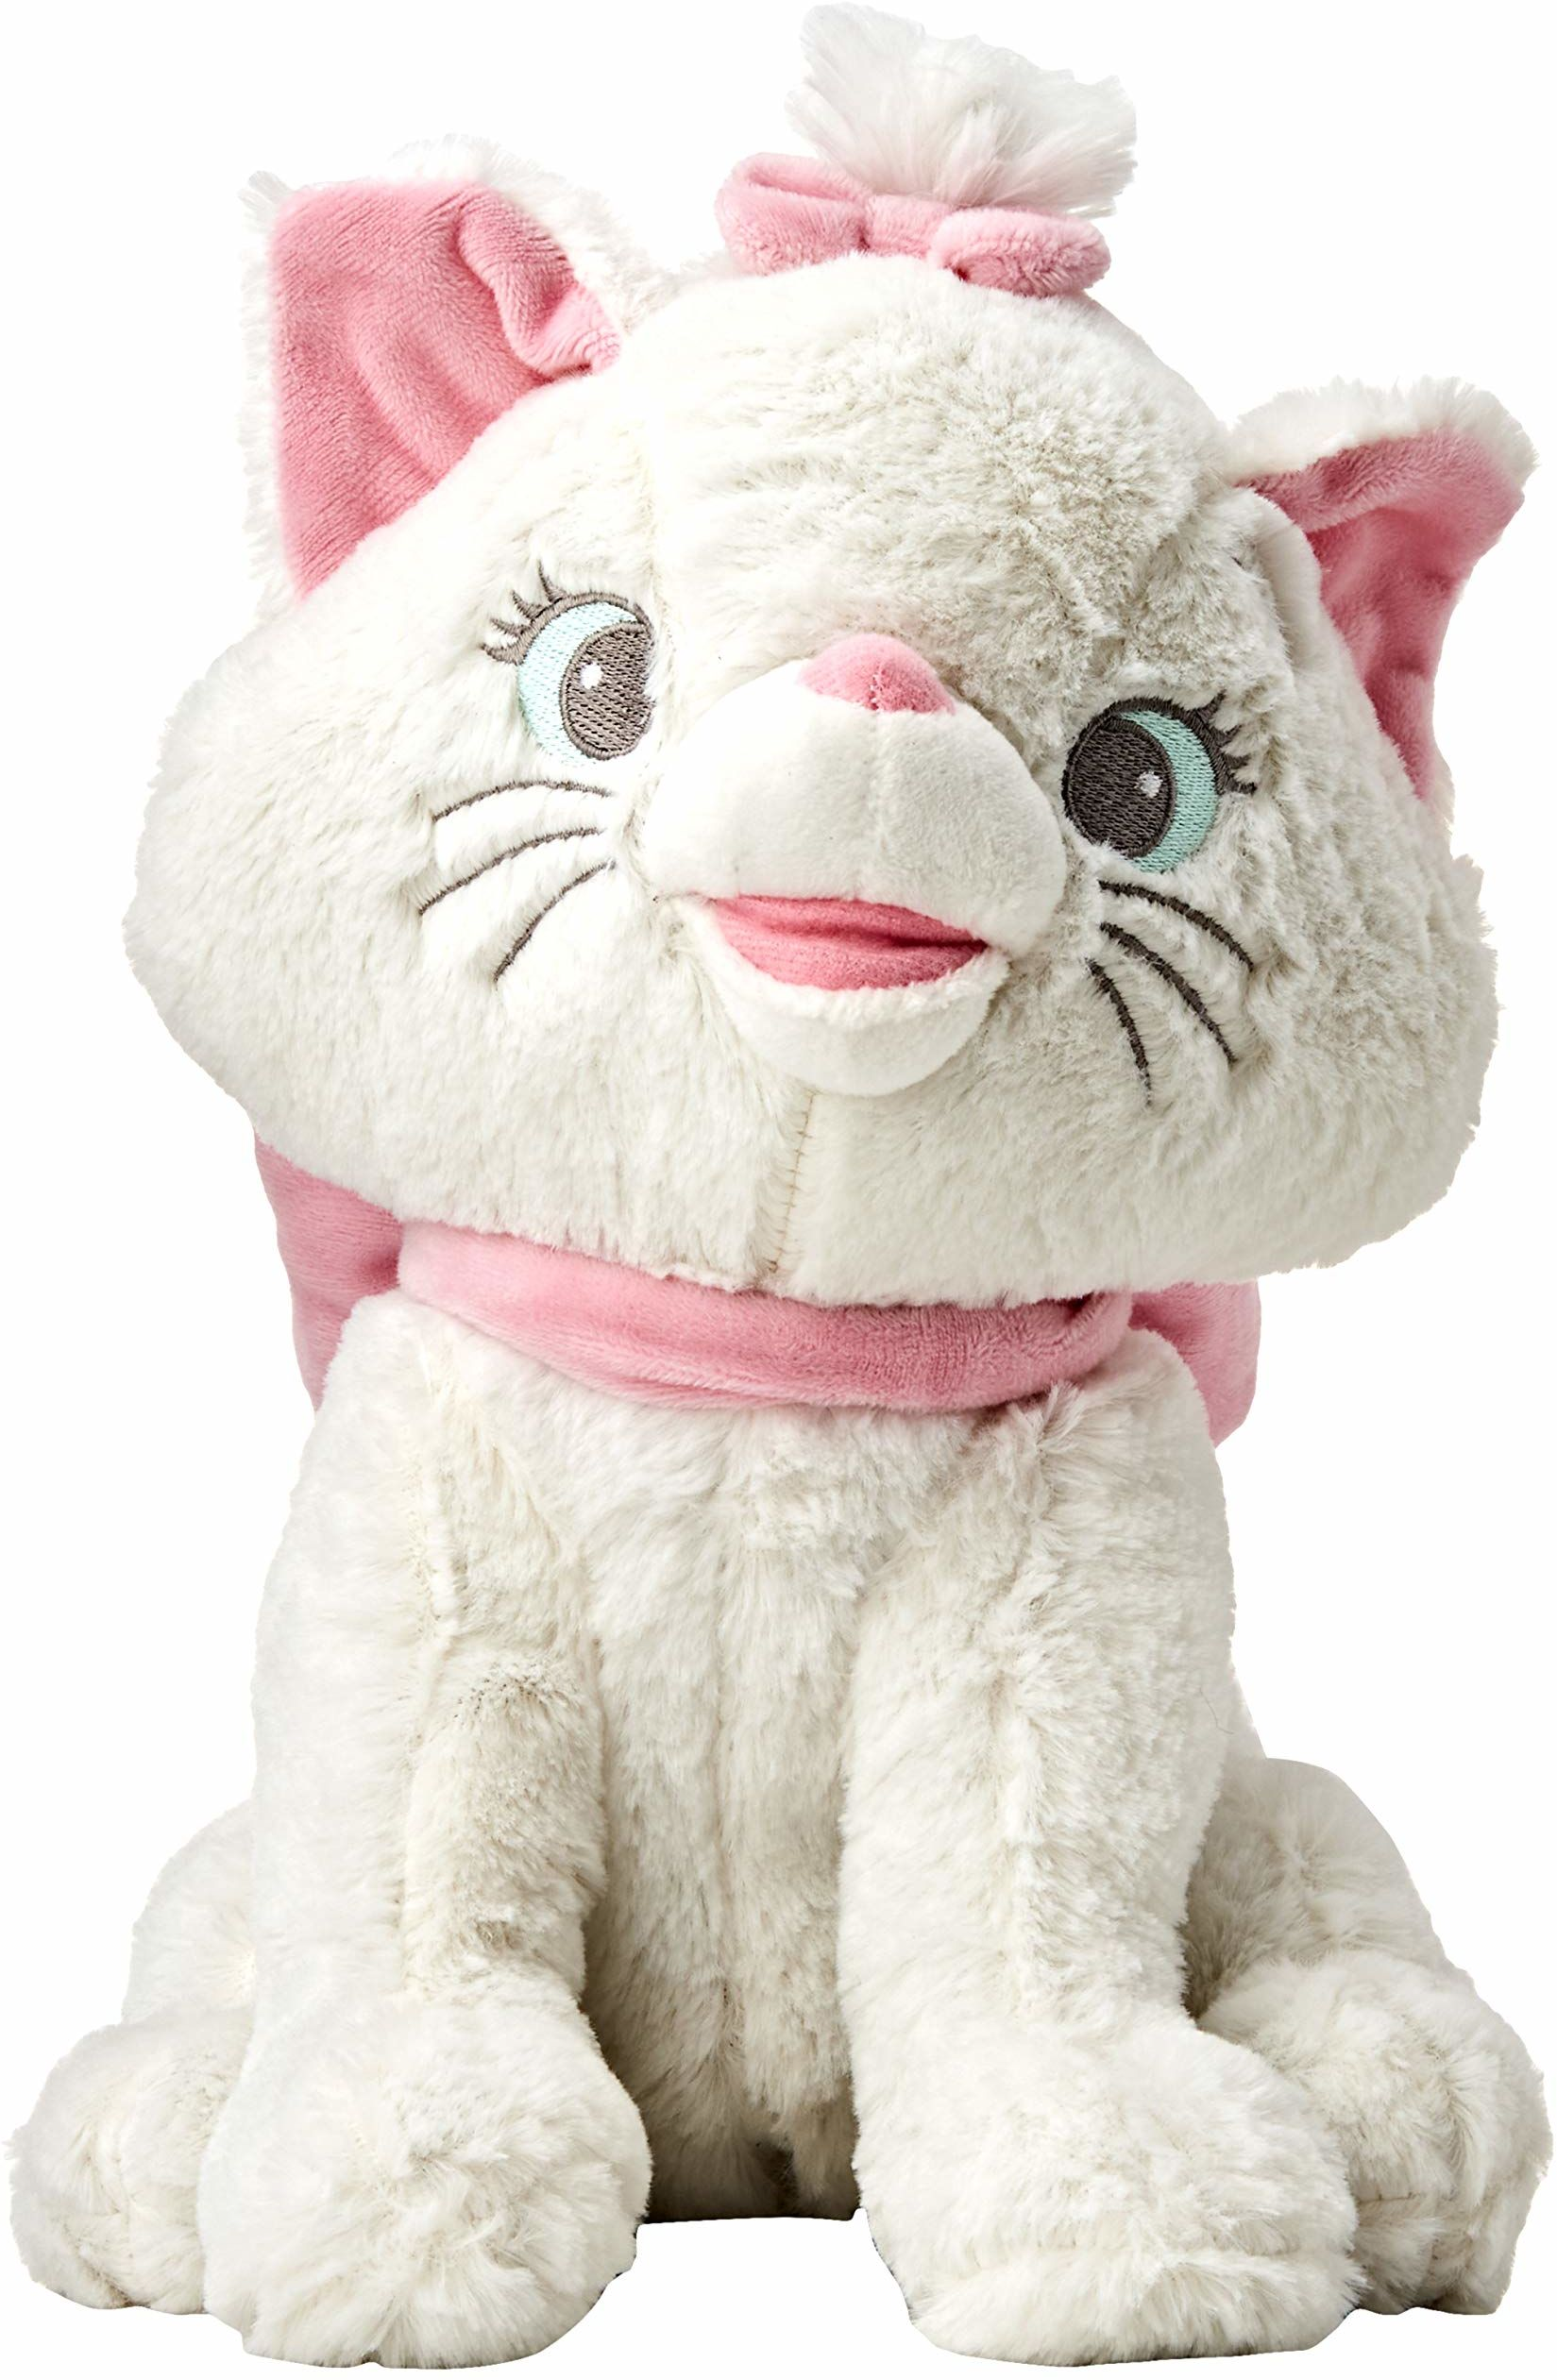 Shok ID shokidpelsho018 Disney muzyczna lampka nocna Marie Les Aristocats pluszowa zabawka